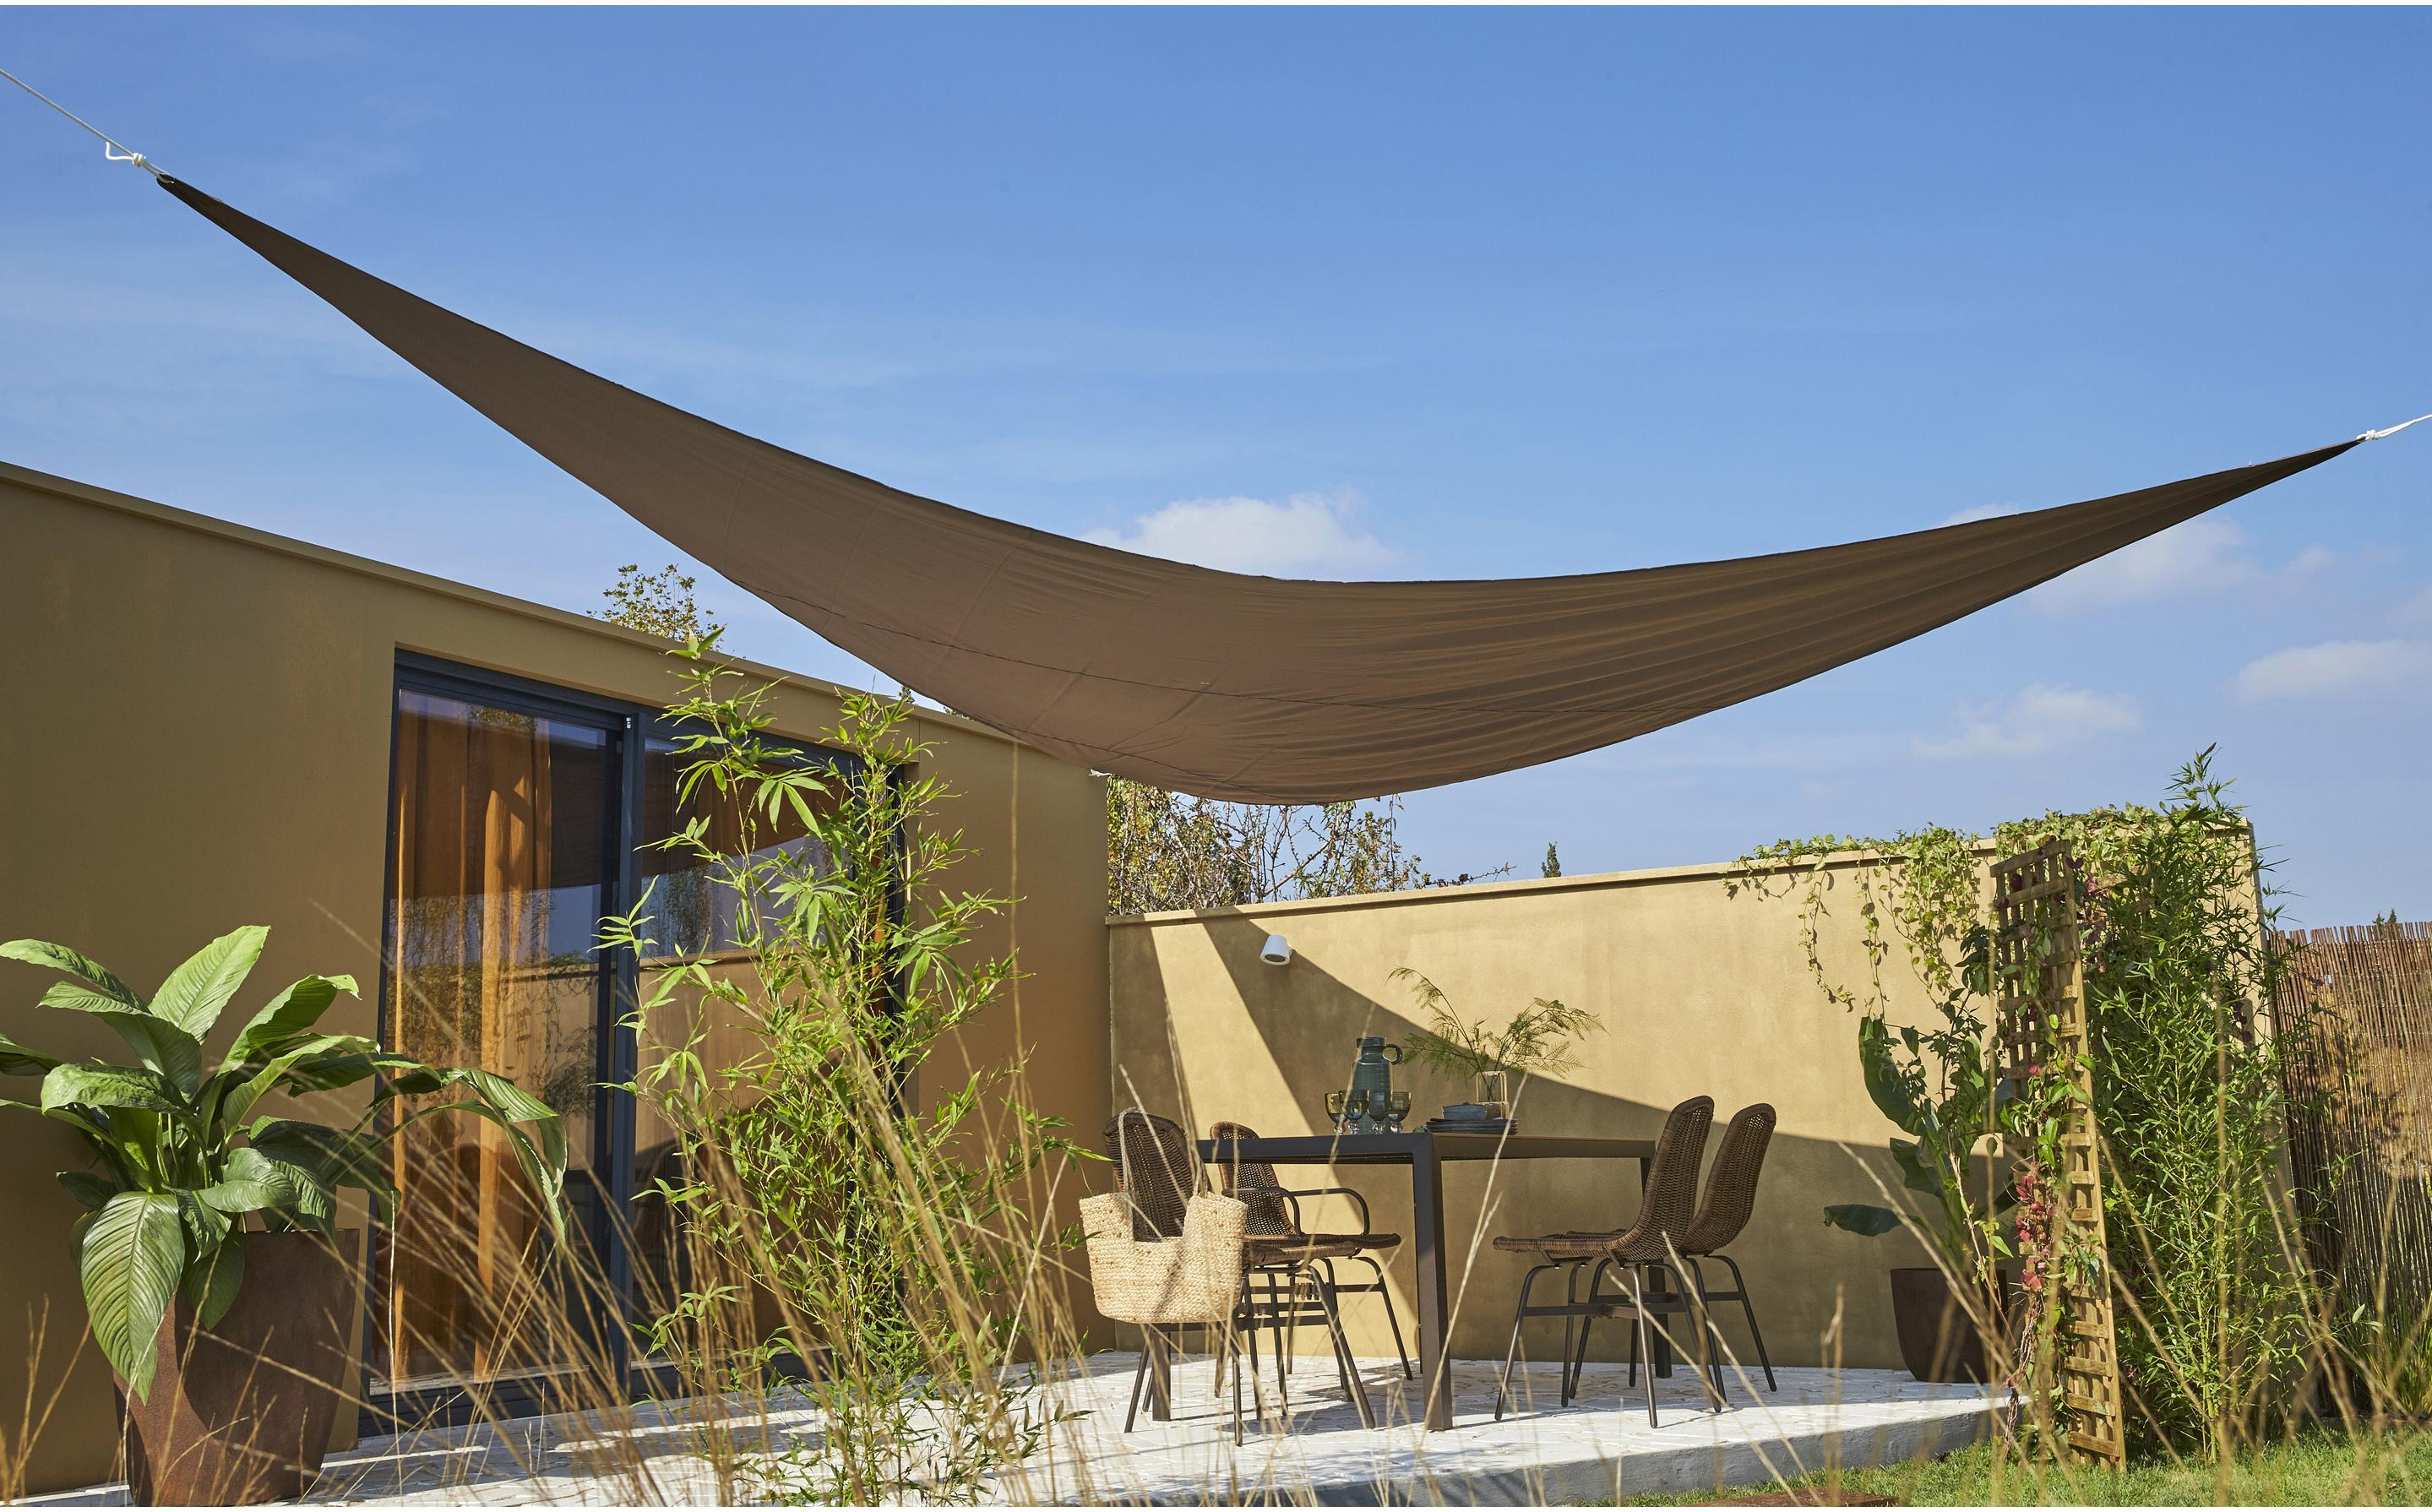 Fixation Voile D Ombrage voile d'ombrage triangulaire brun bistro l.500 x l.500 cm